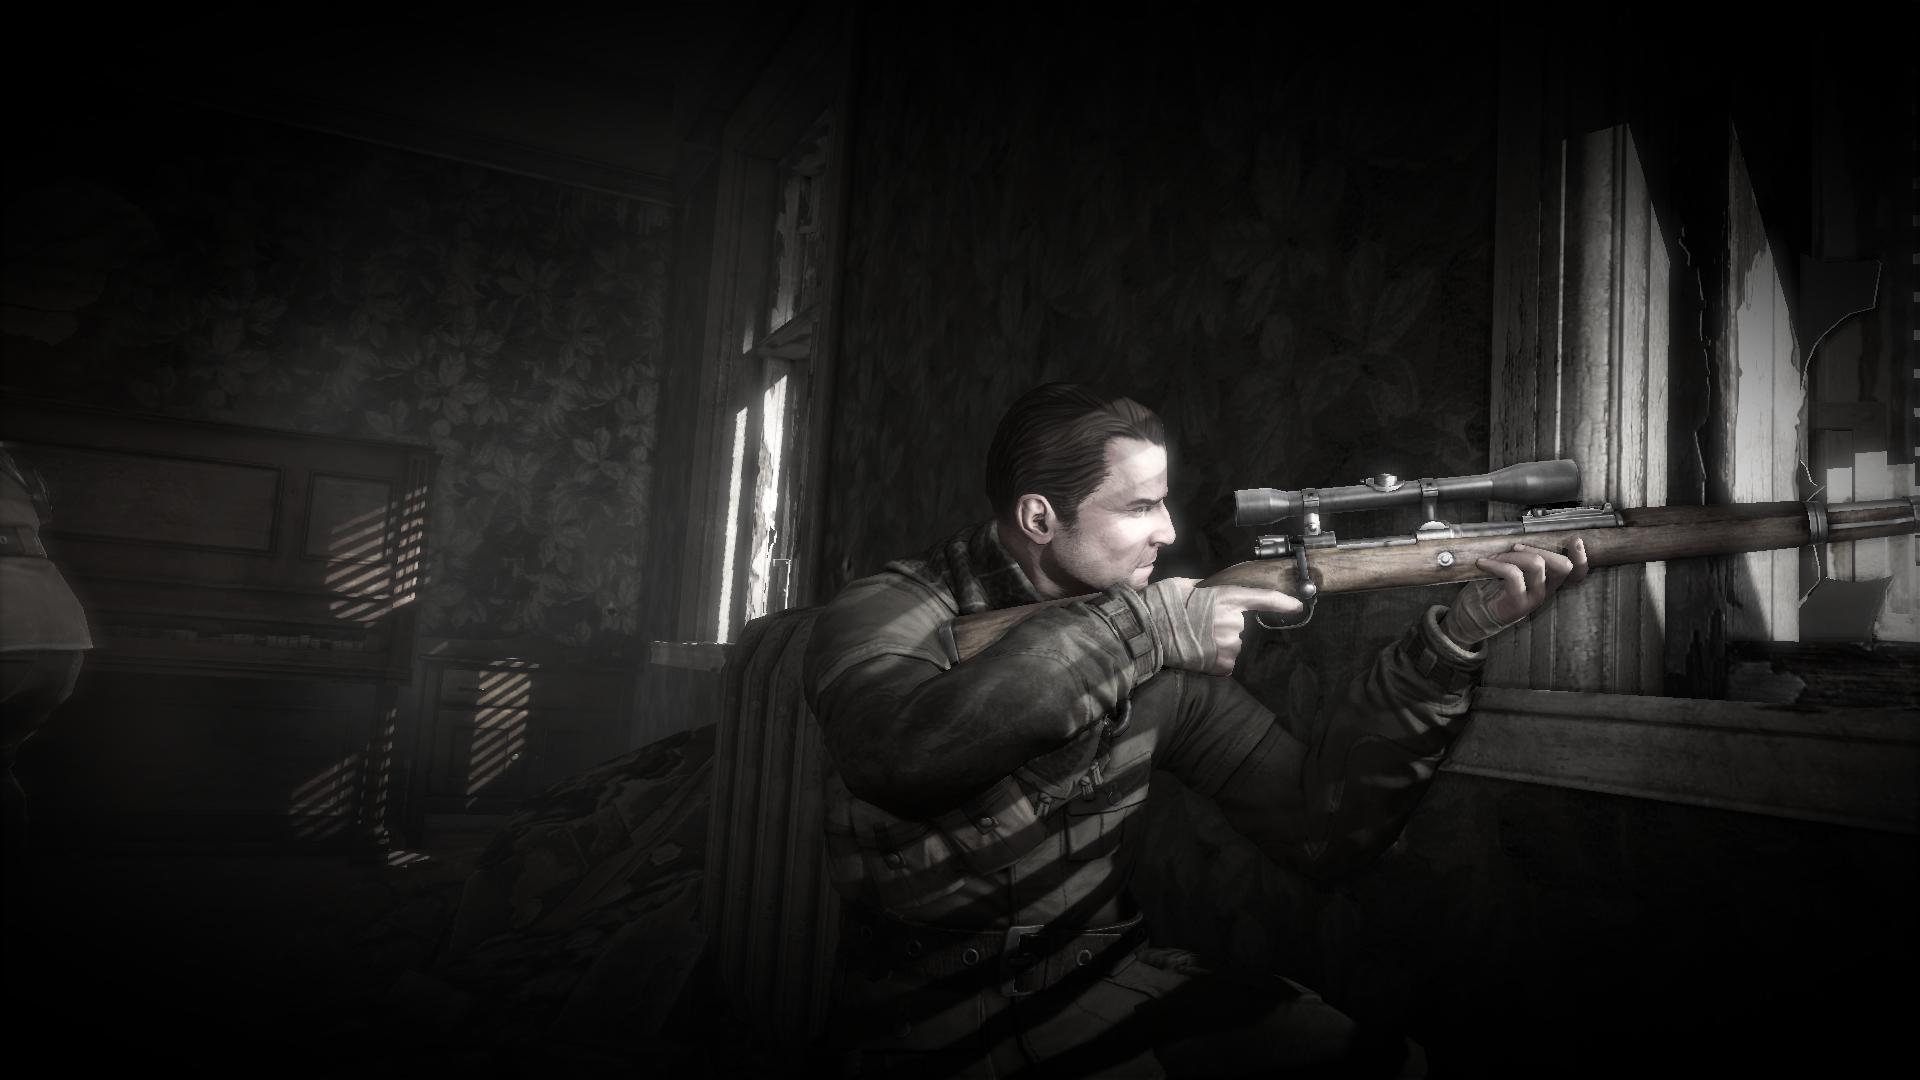 Sniper Elite V2 HD Wallpaper Background Image 1920x1080 ID 1920x1080